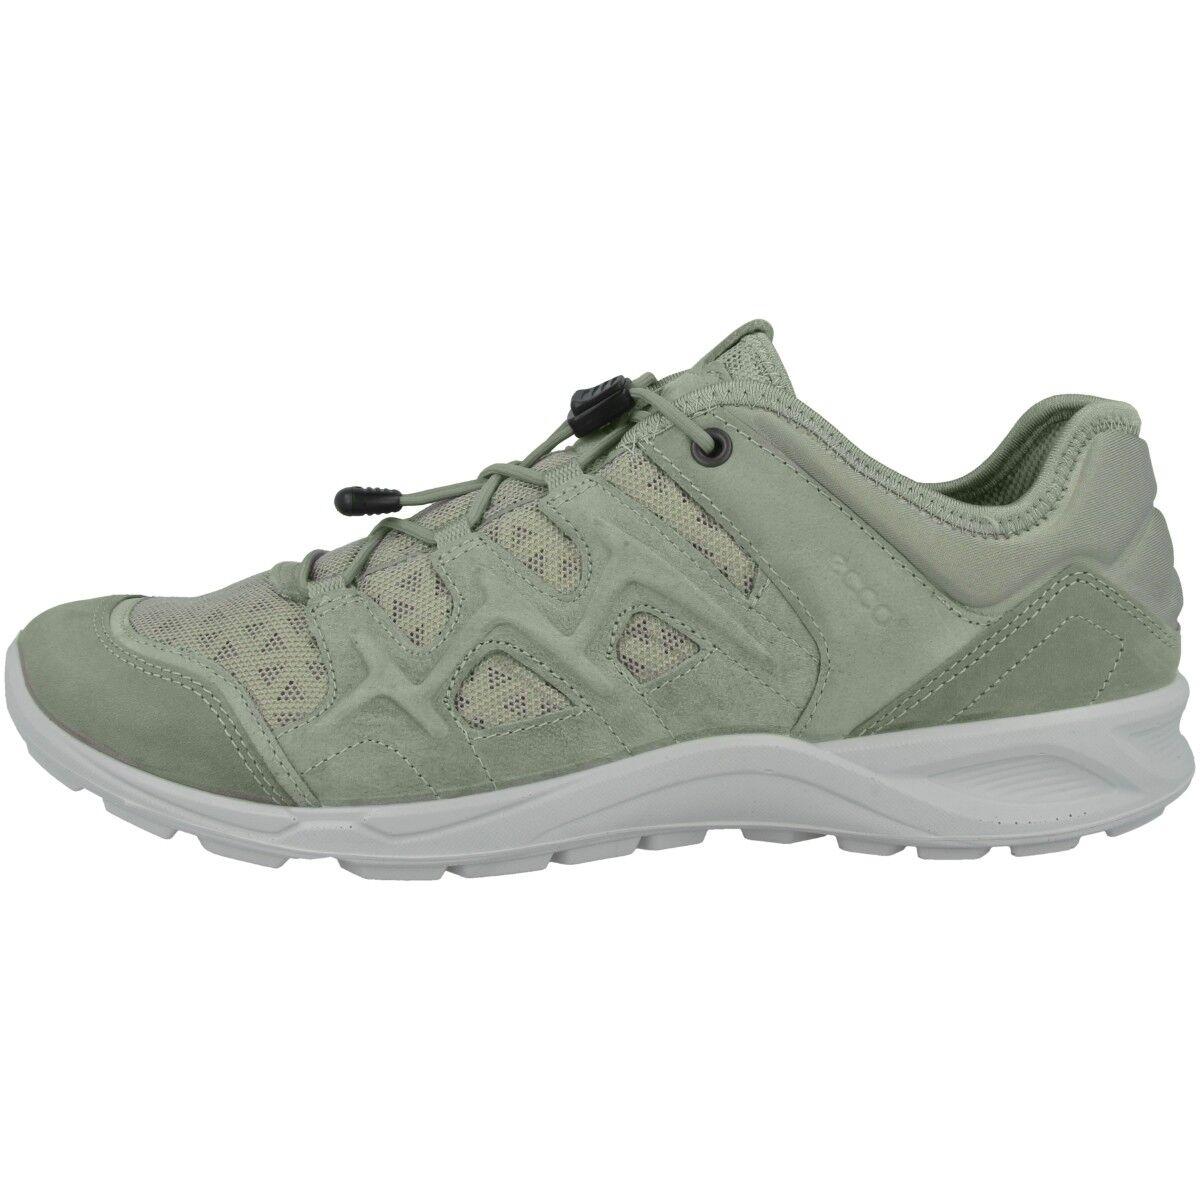 Ecco Terracruise LT Ladies Trekking Outdoor Outdoor Outdoor Scarpe scarpe da ginnastica dove sei 82576356393 061a6c